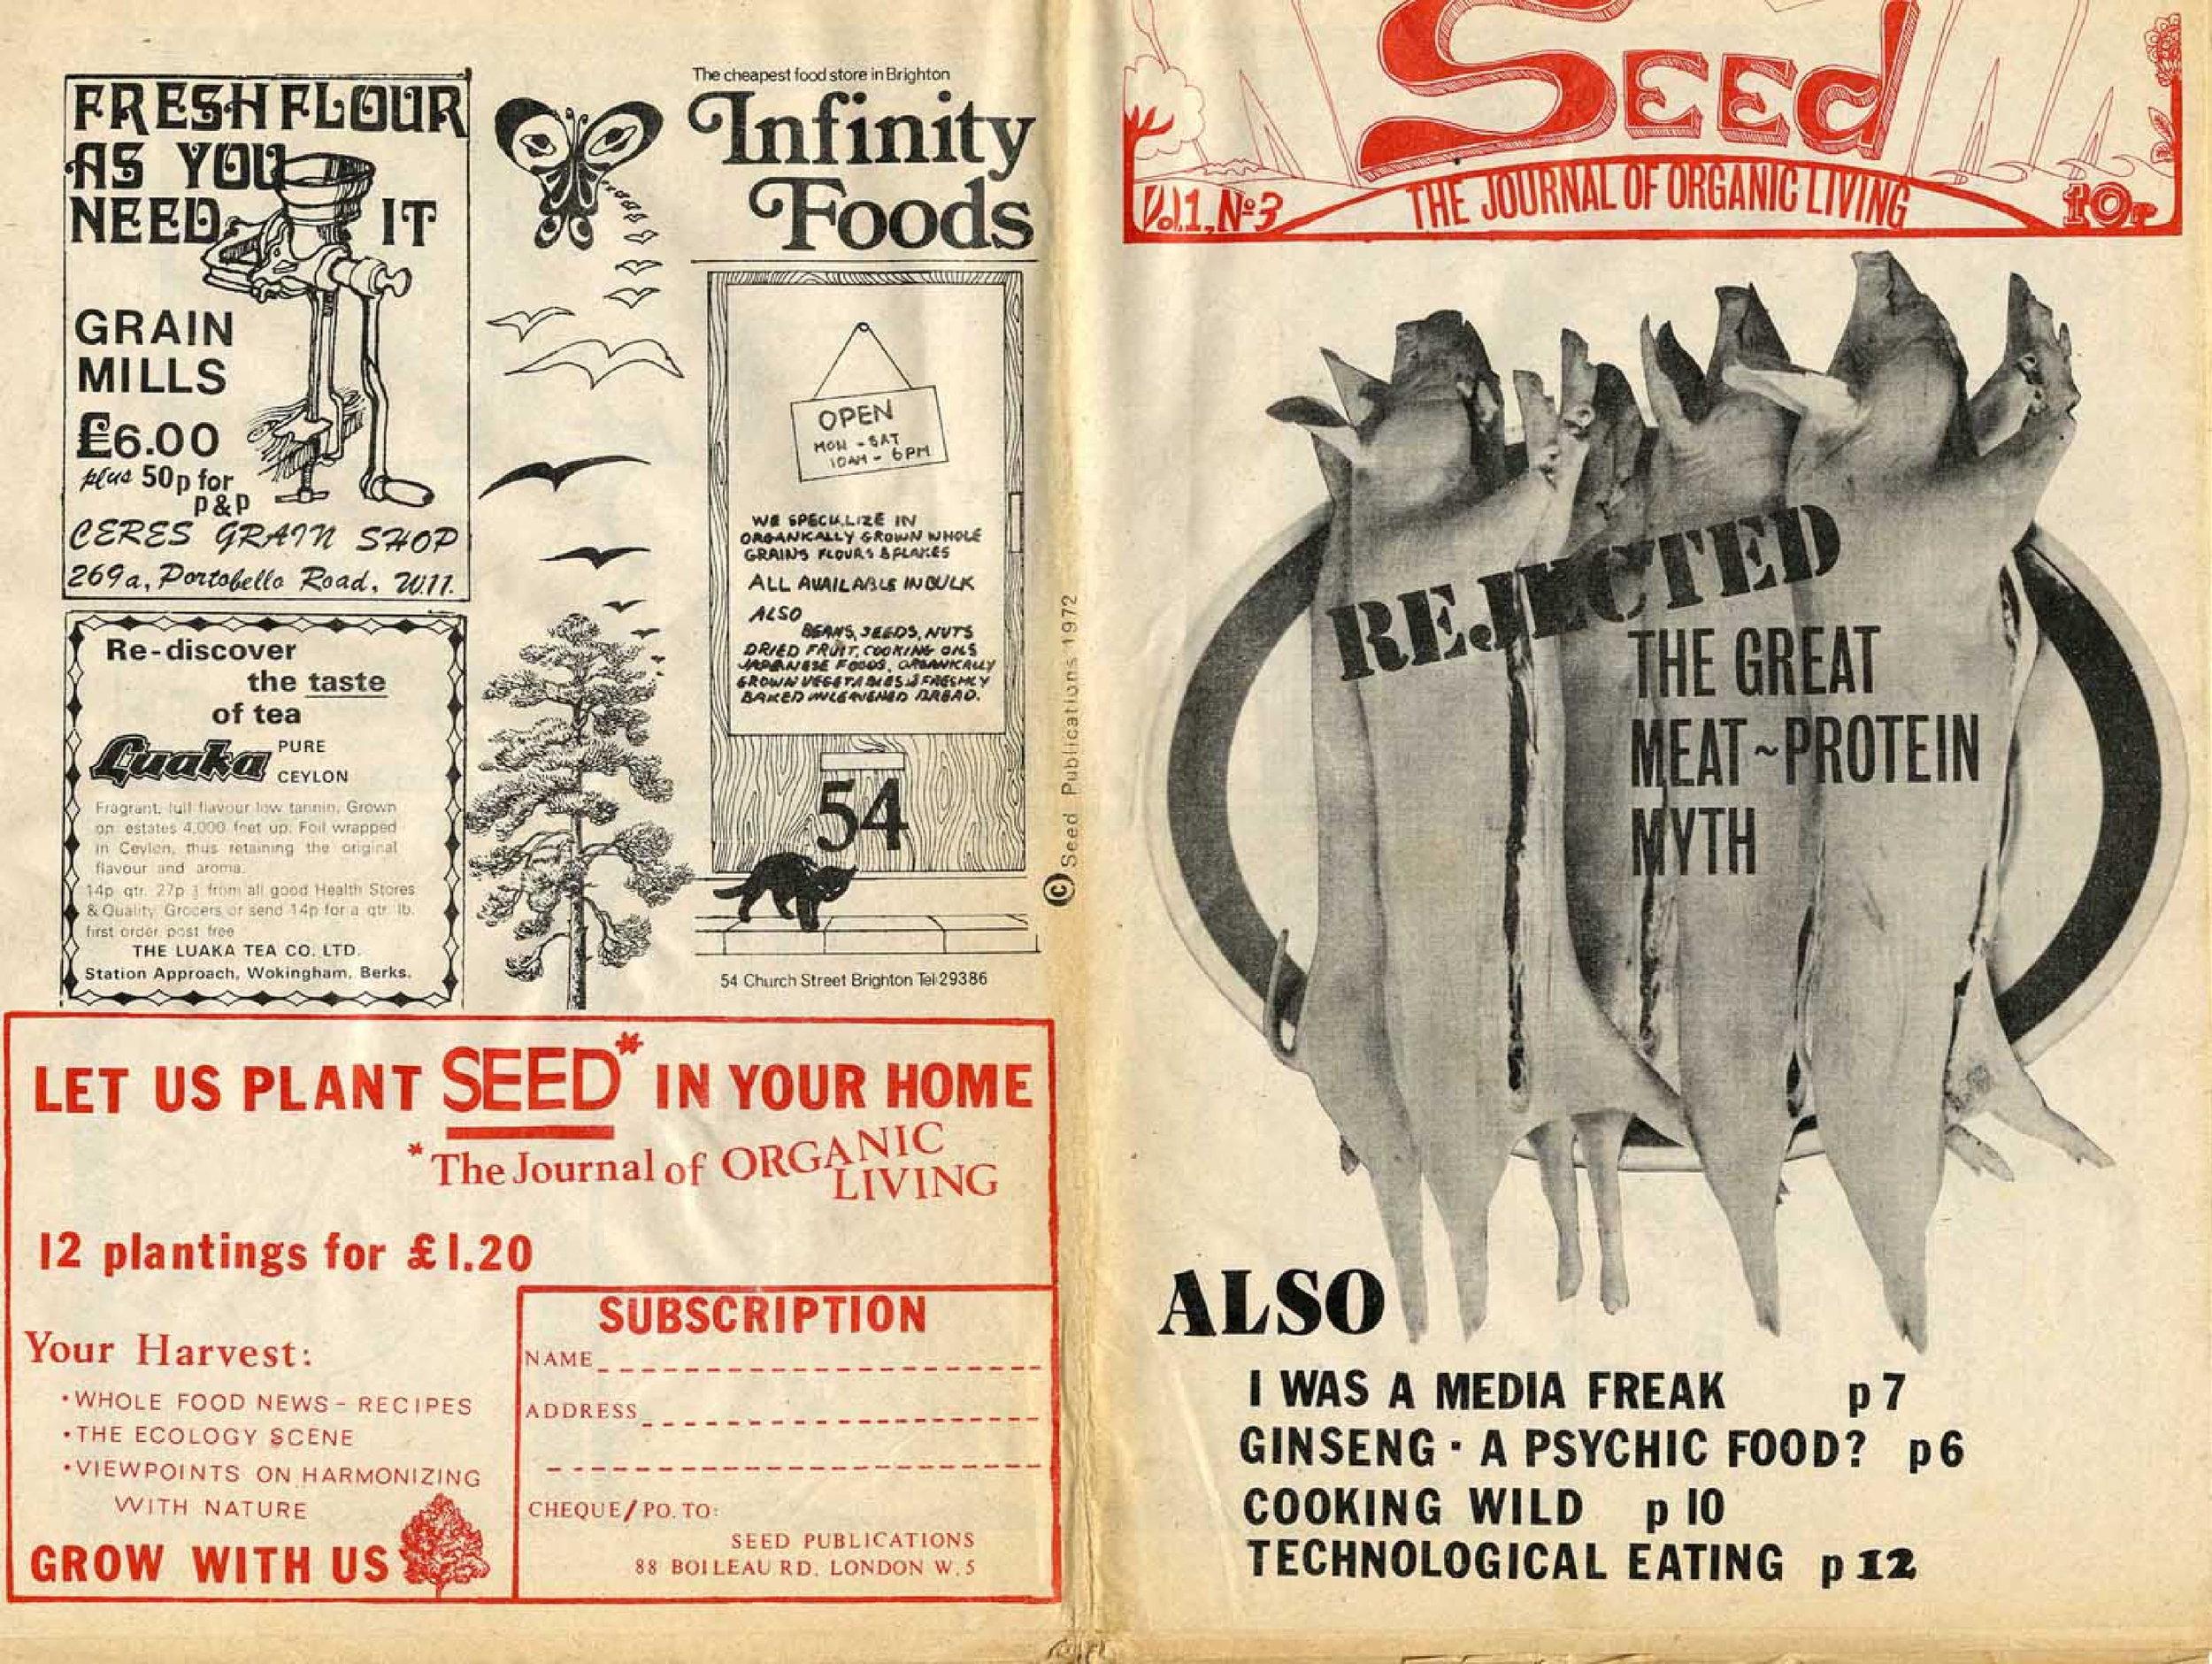 seed-v1-n3-april1972-16.jpg